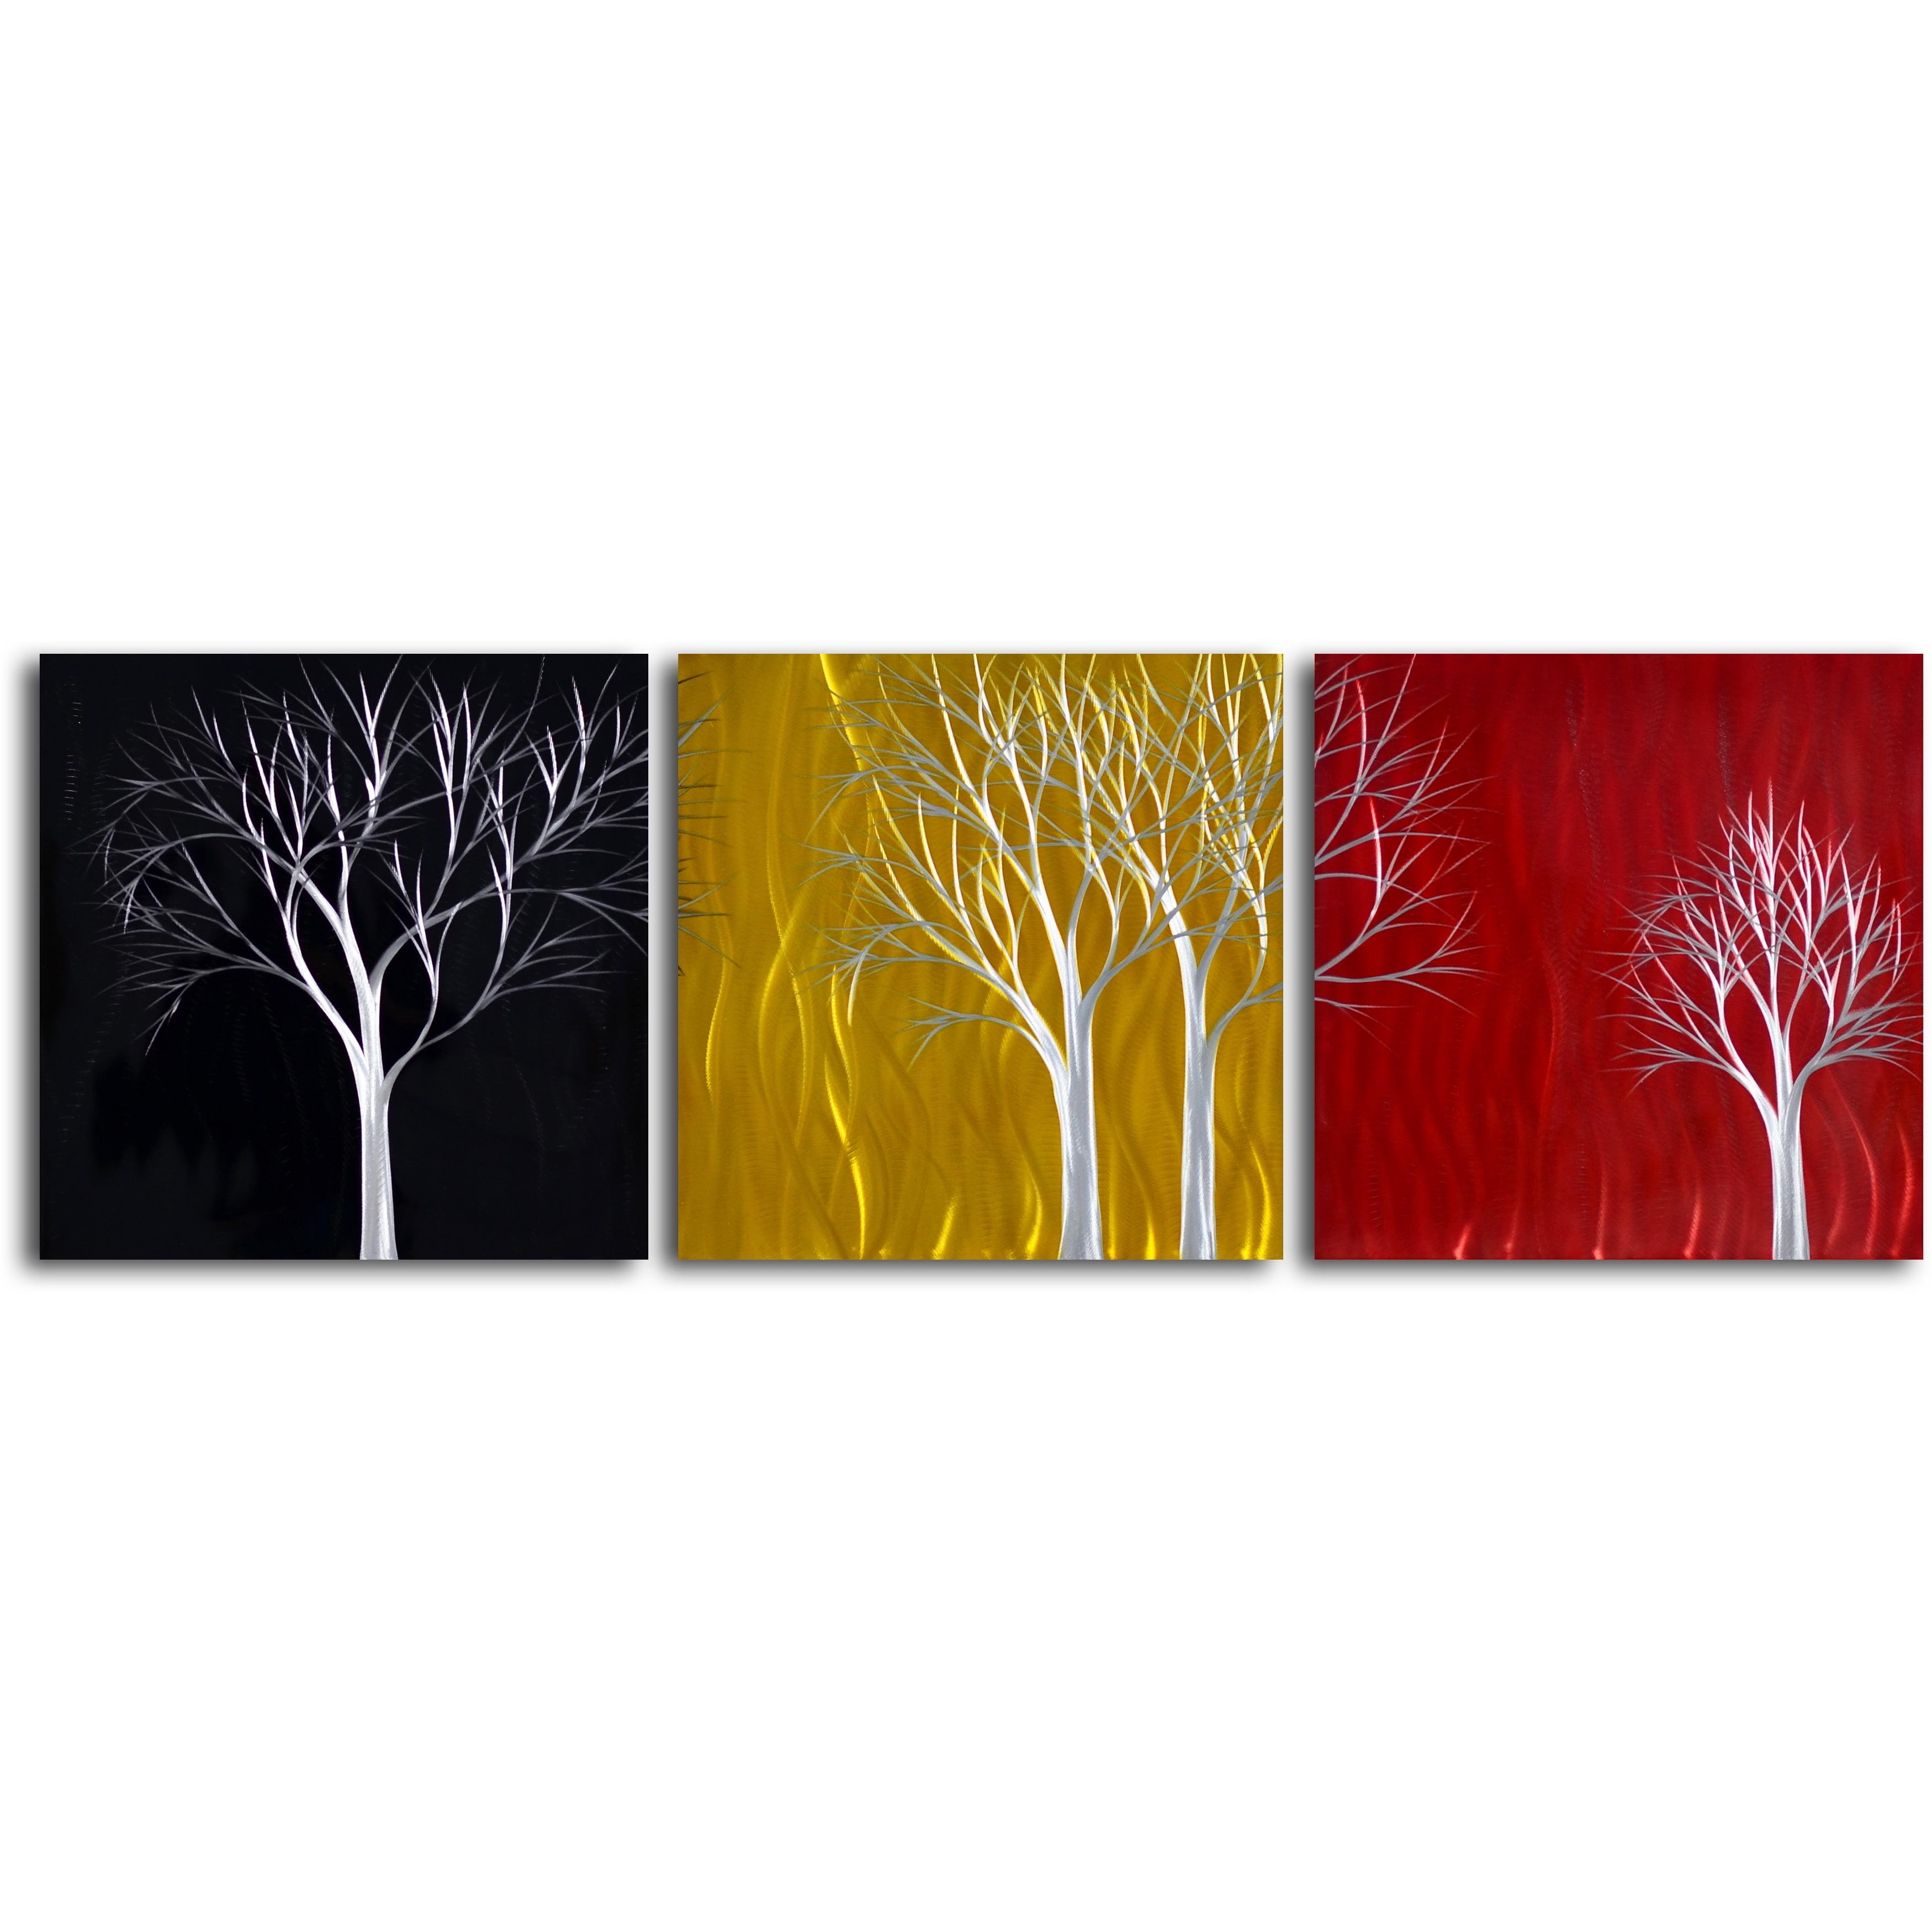 Seasons Pass\' Handcrafted 3-piece Metal Wall Art Set - Free Shipping ...